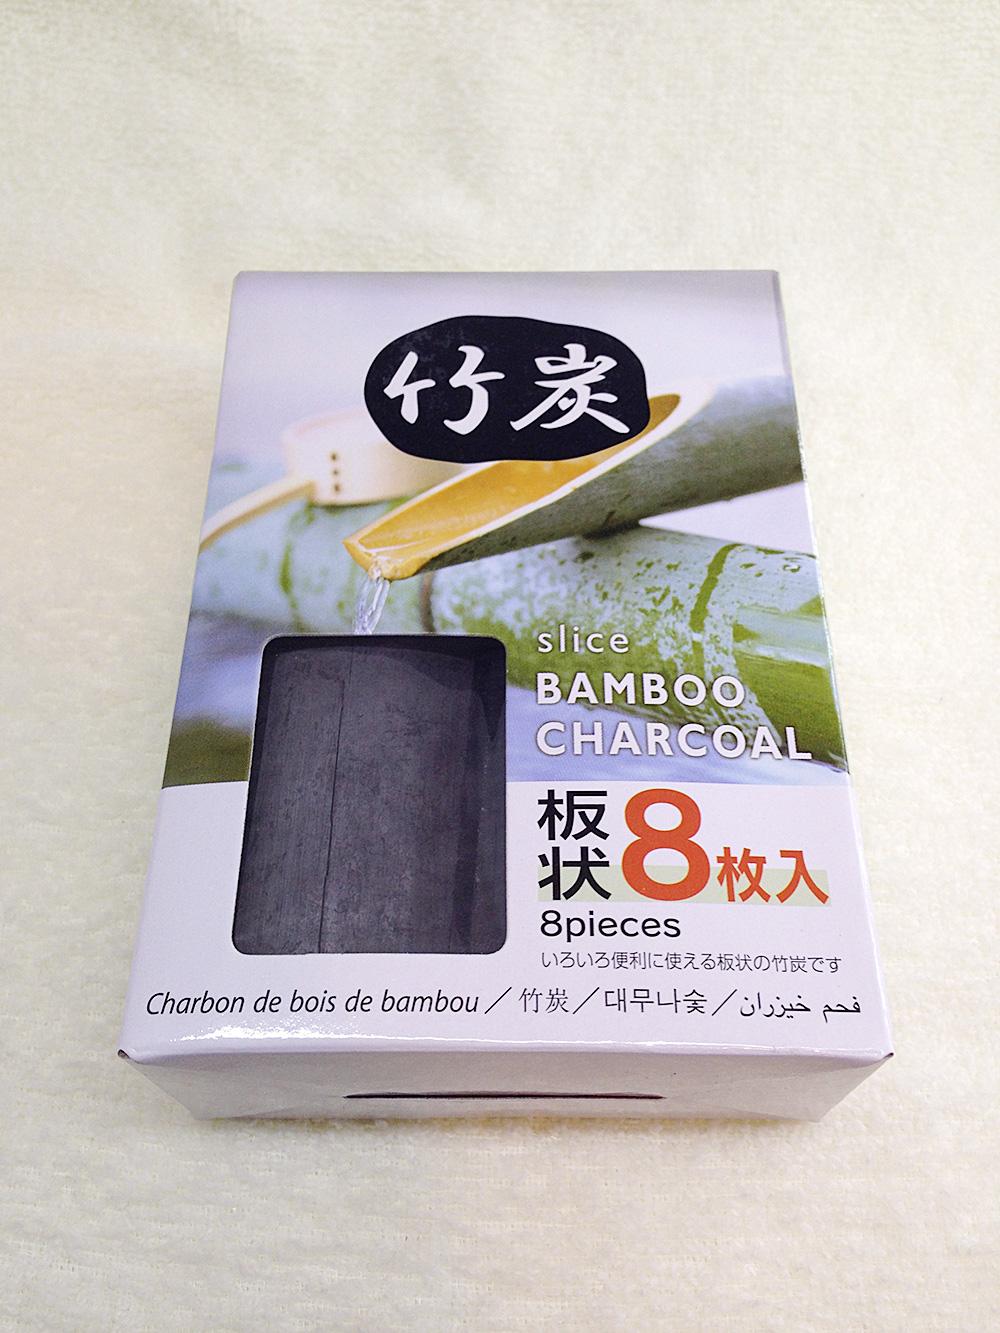 ダイソー100円の竹炭